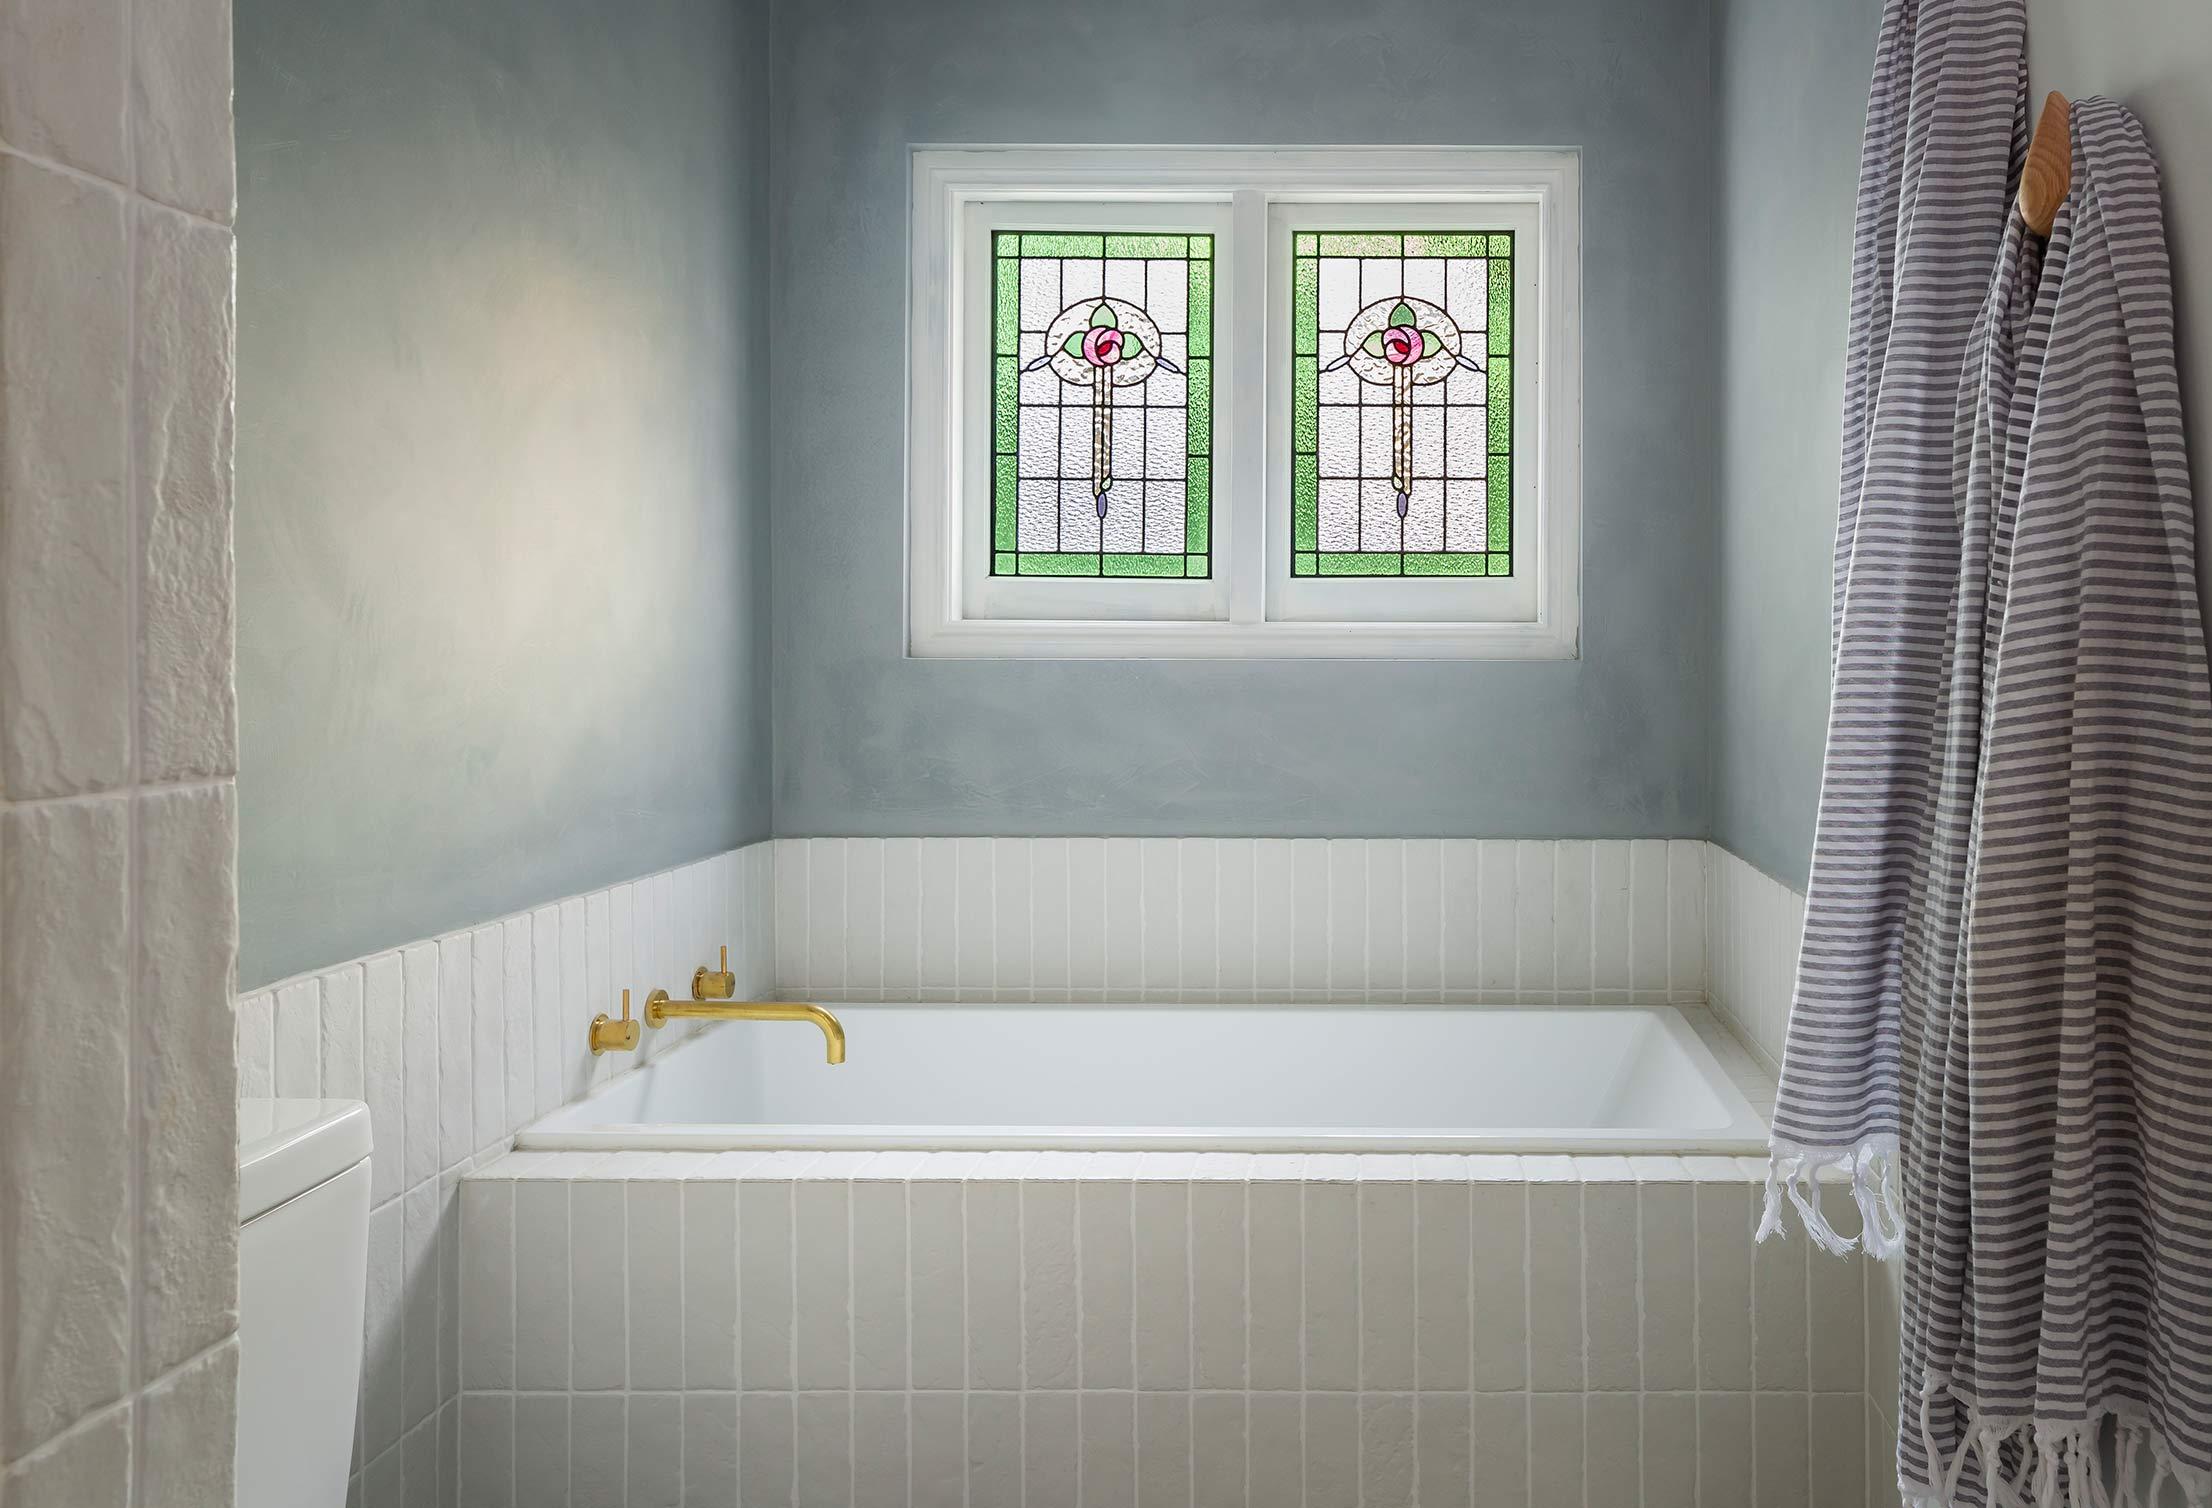 turnbull-built-renovation-bathroom-goodwood-sa.jpg